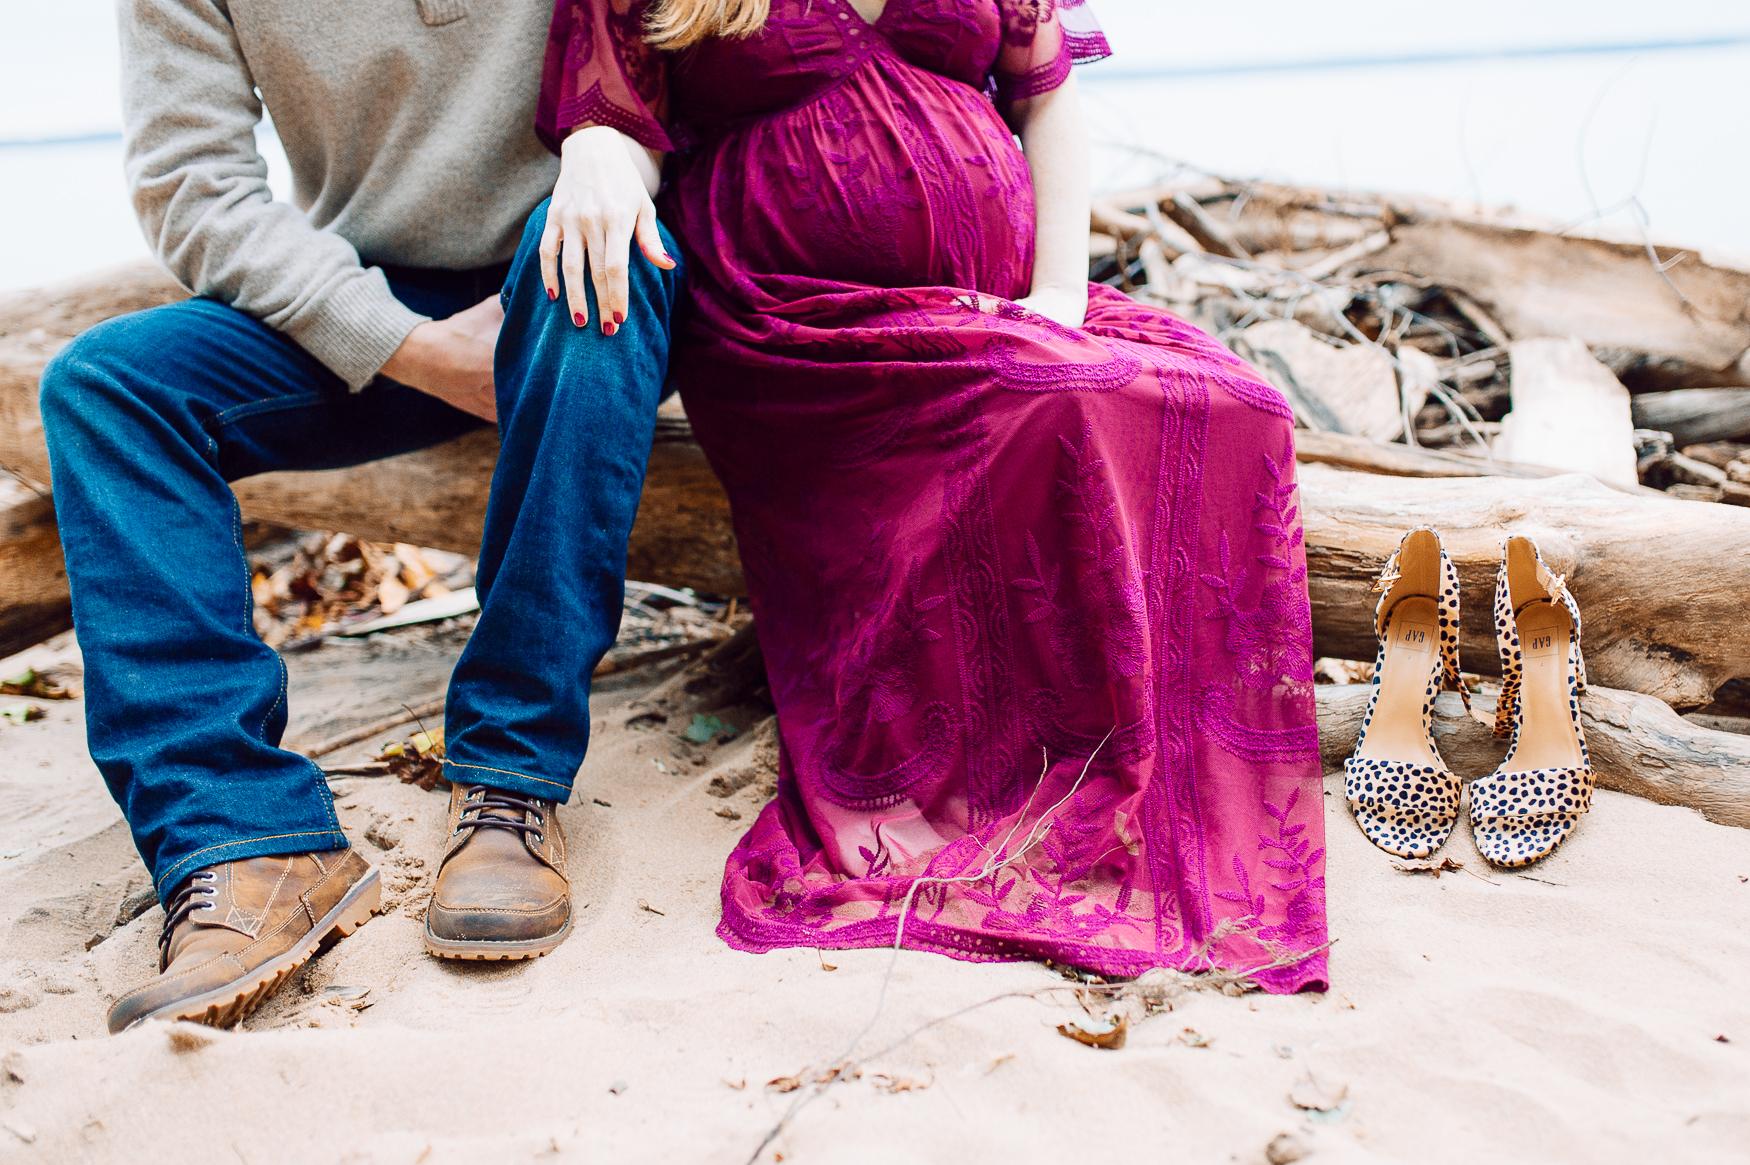 maternity_fallphotos_fredericksburgphotographer_leesylvania_youseephotography_Heather (55).jpg